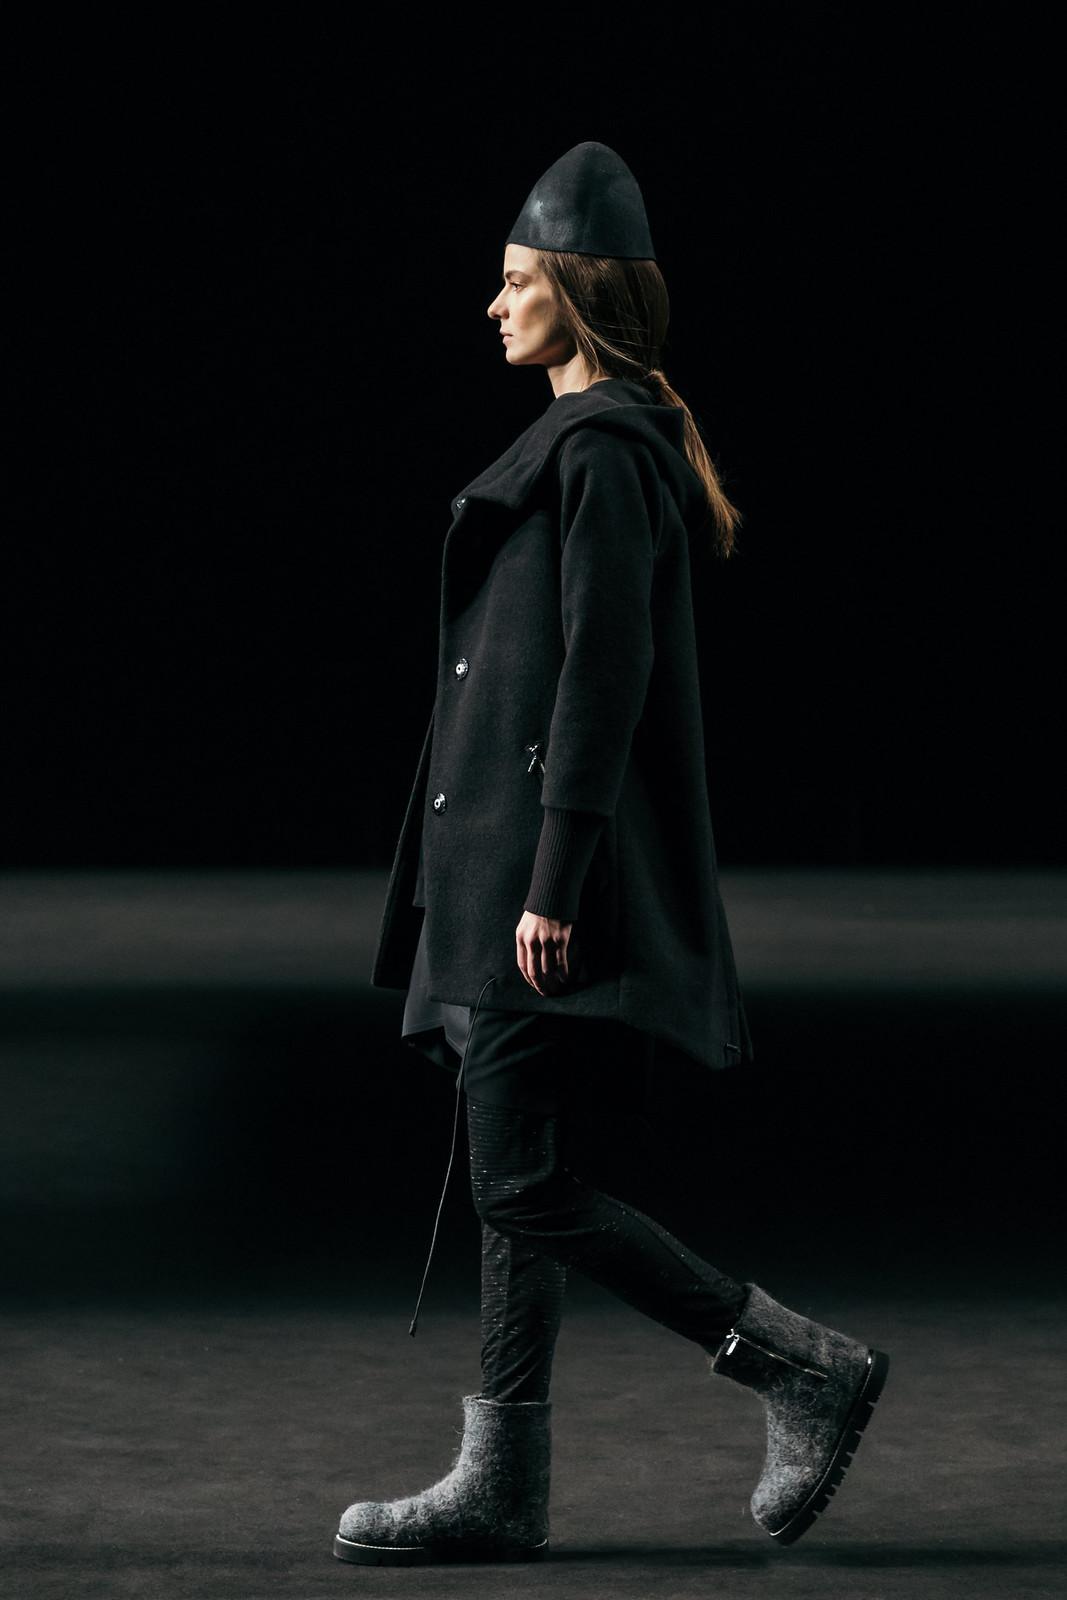 Jessie Chanes - Seams for a desire - 080 Bacelona Fashion #080bcnfasion -26